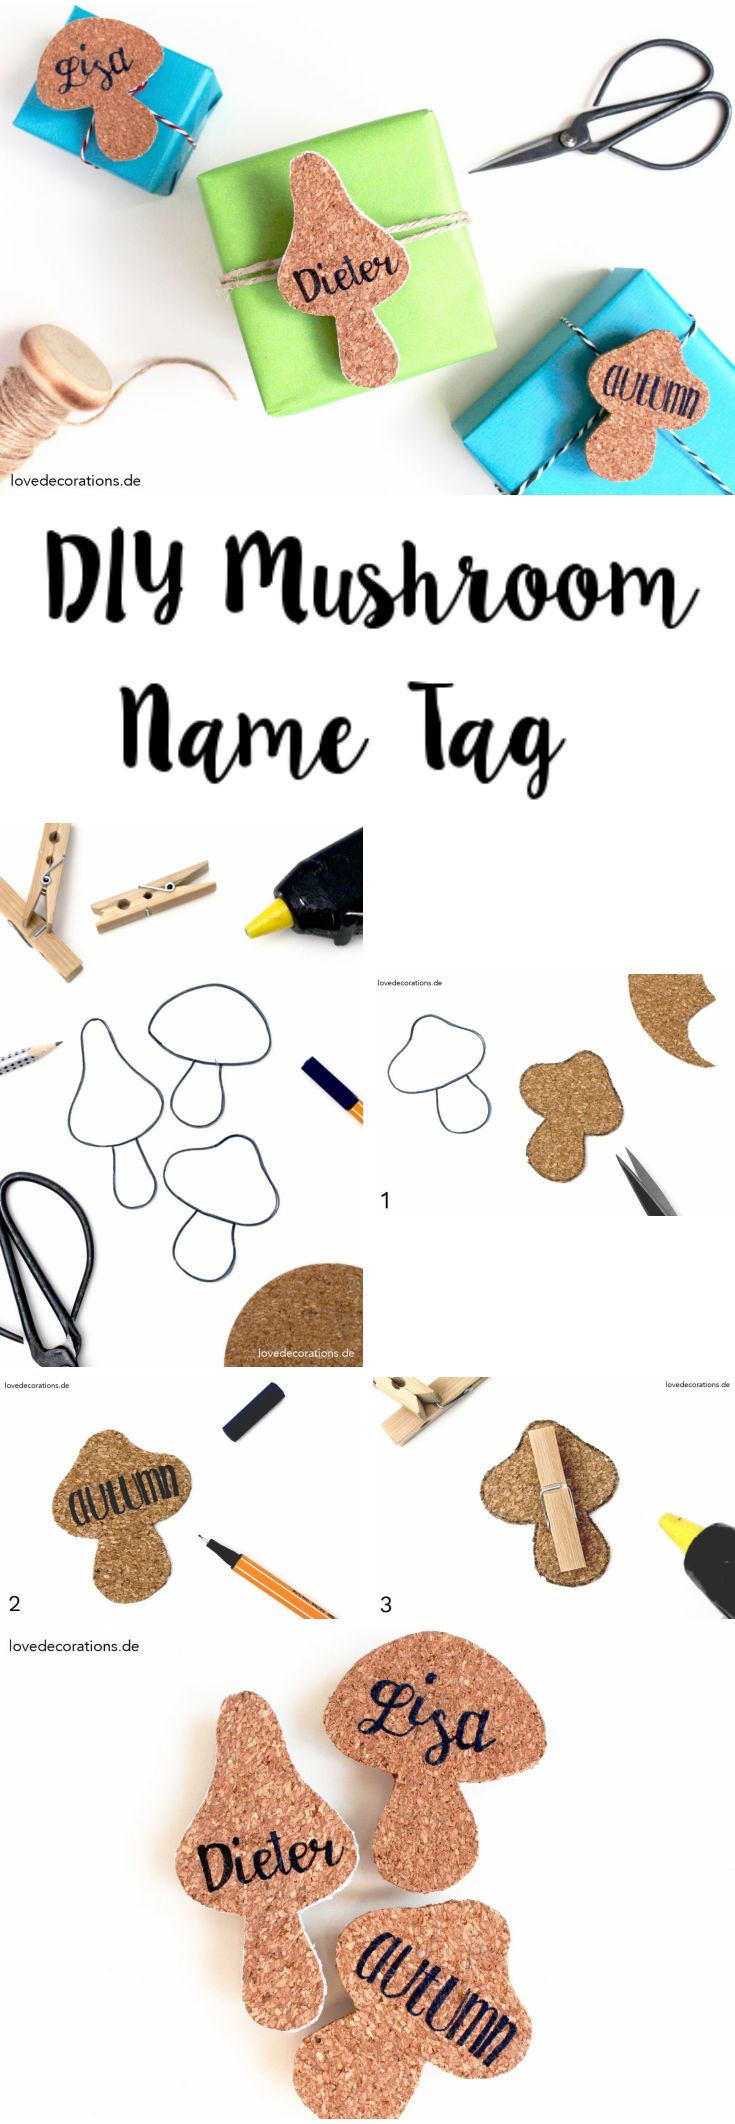 DIY Mushroom Name Tag made of Cork l Tolle Geschenkverpackung l Kork Geschenkanhänger basteln